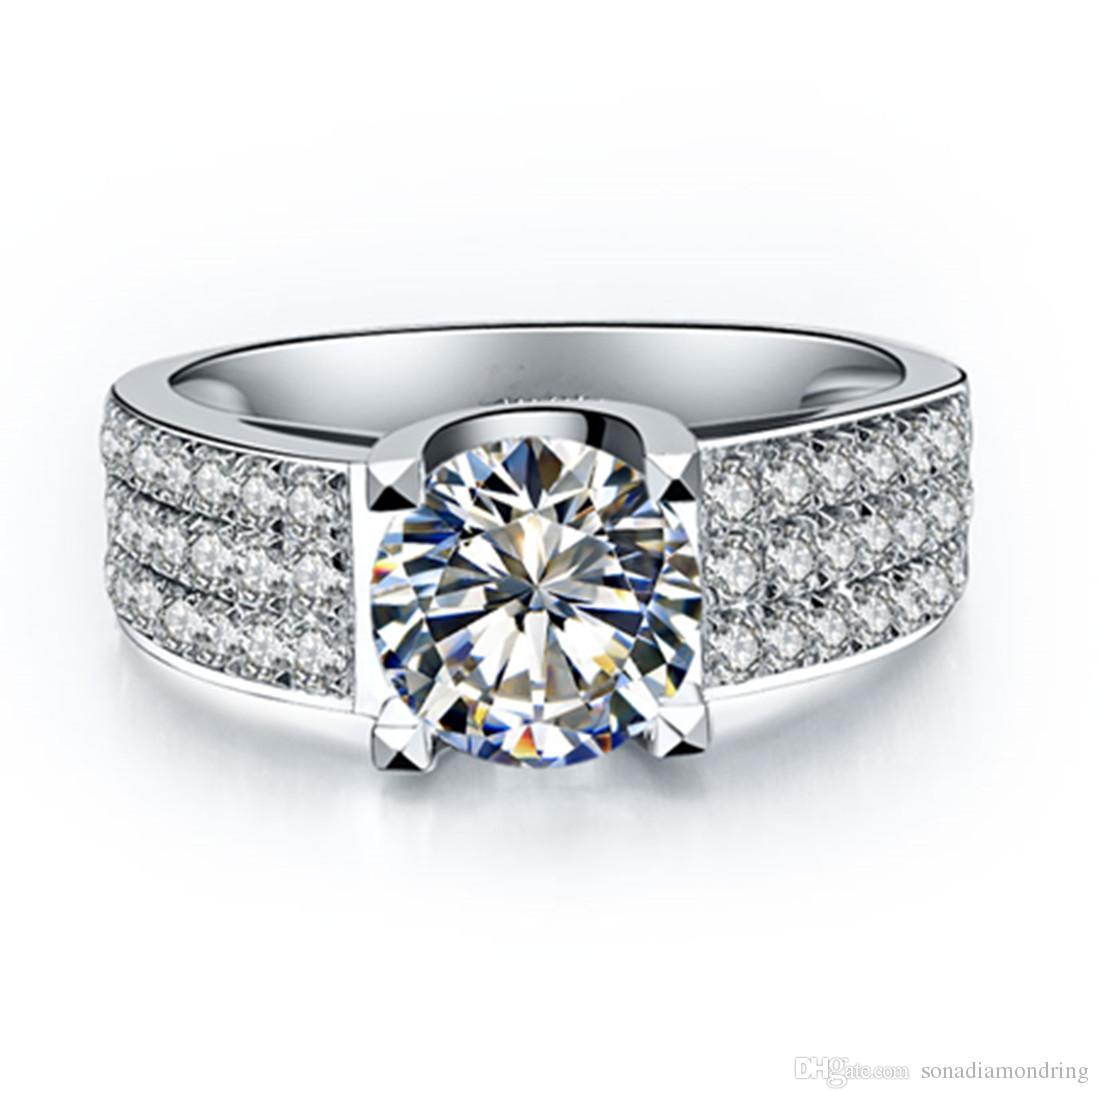 775fa3d8fab2 Compre 1 Ct Anillos De Diamantes Sintéticos Para Mujer Anillo Chapado En Oro  Blanco De 18K Para Dama Anillos De Compromiso De Plata 925 Para Mujeres A  ...